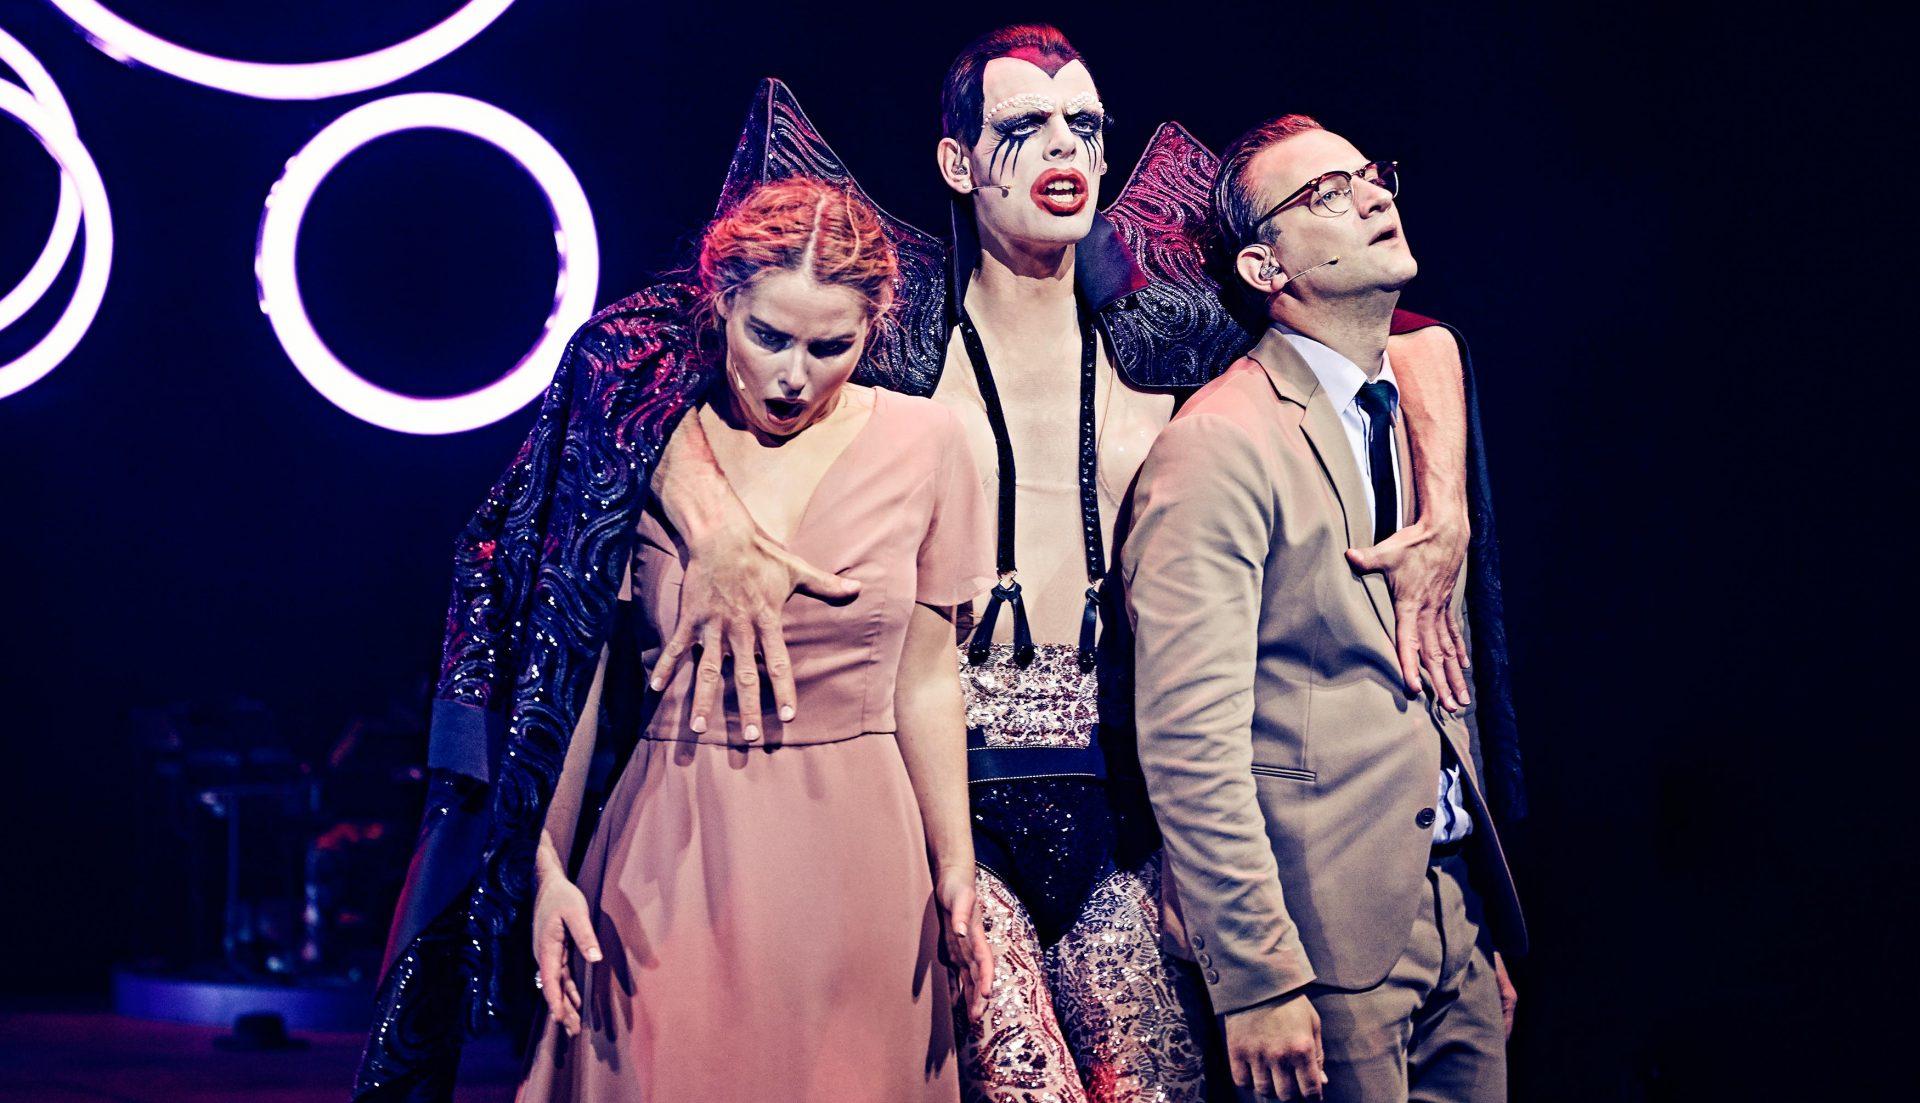 The Rocky Horror Show: Vanvittigt orgie med sex og publikums interageren